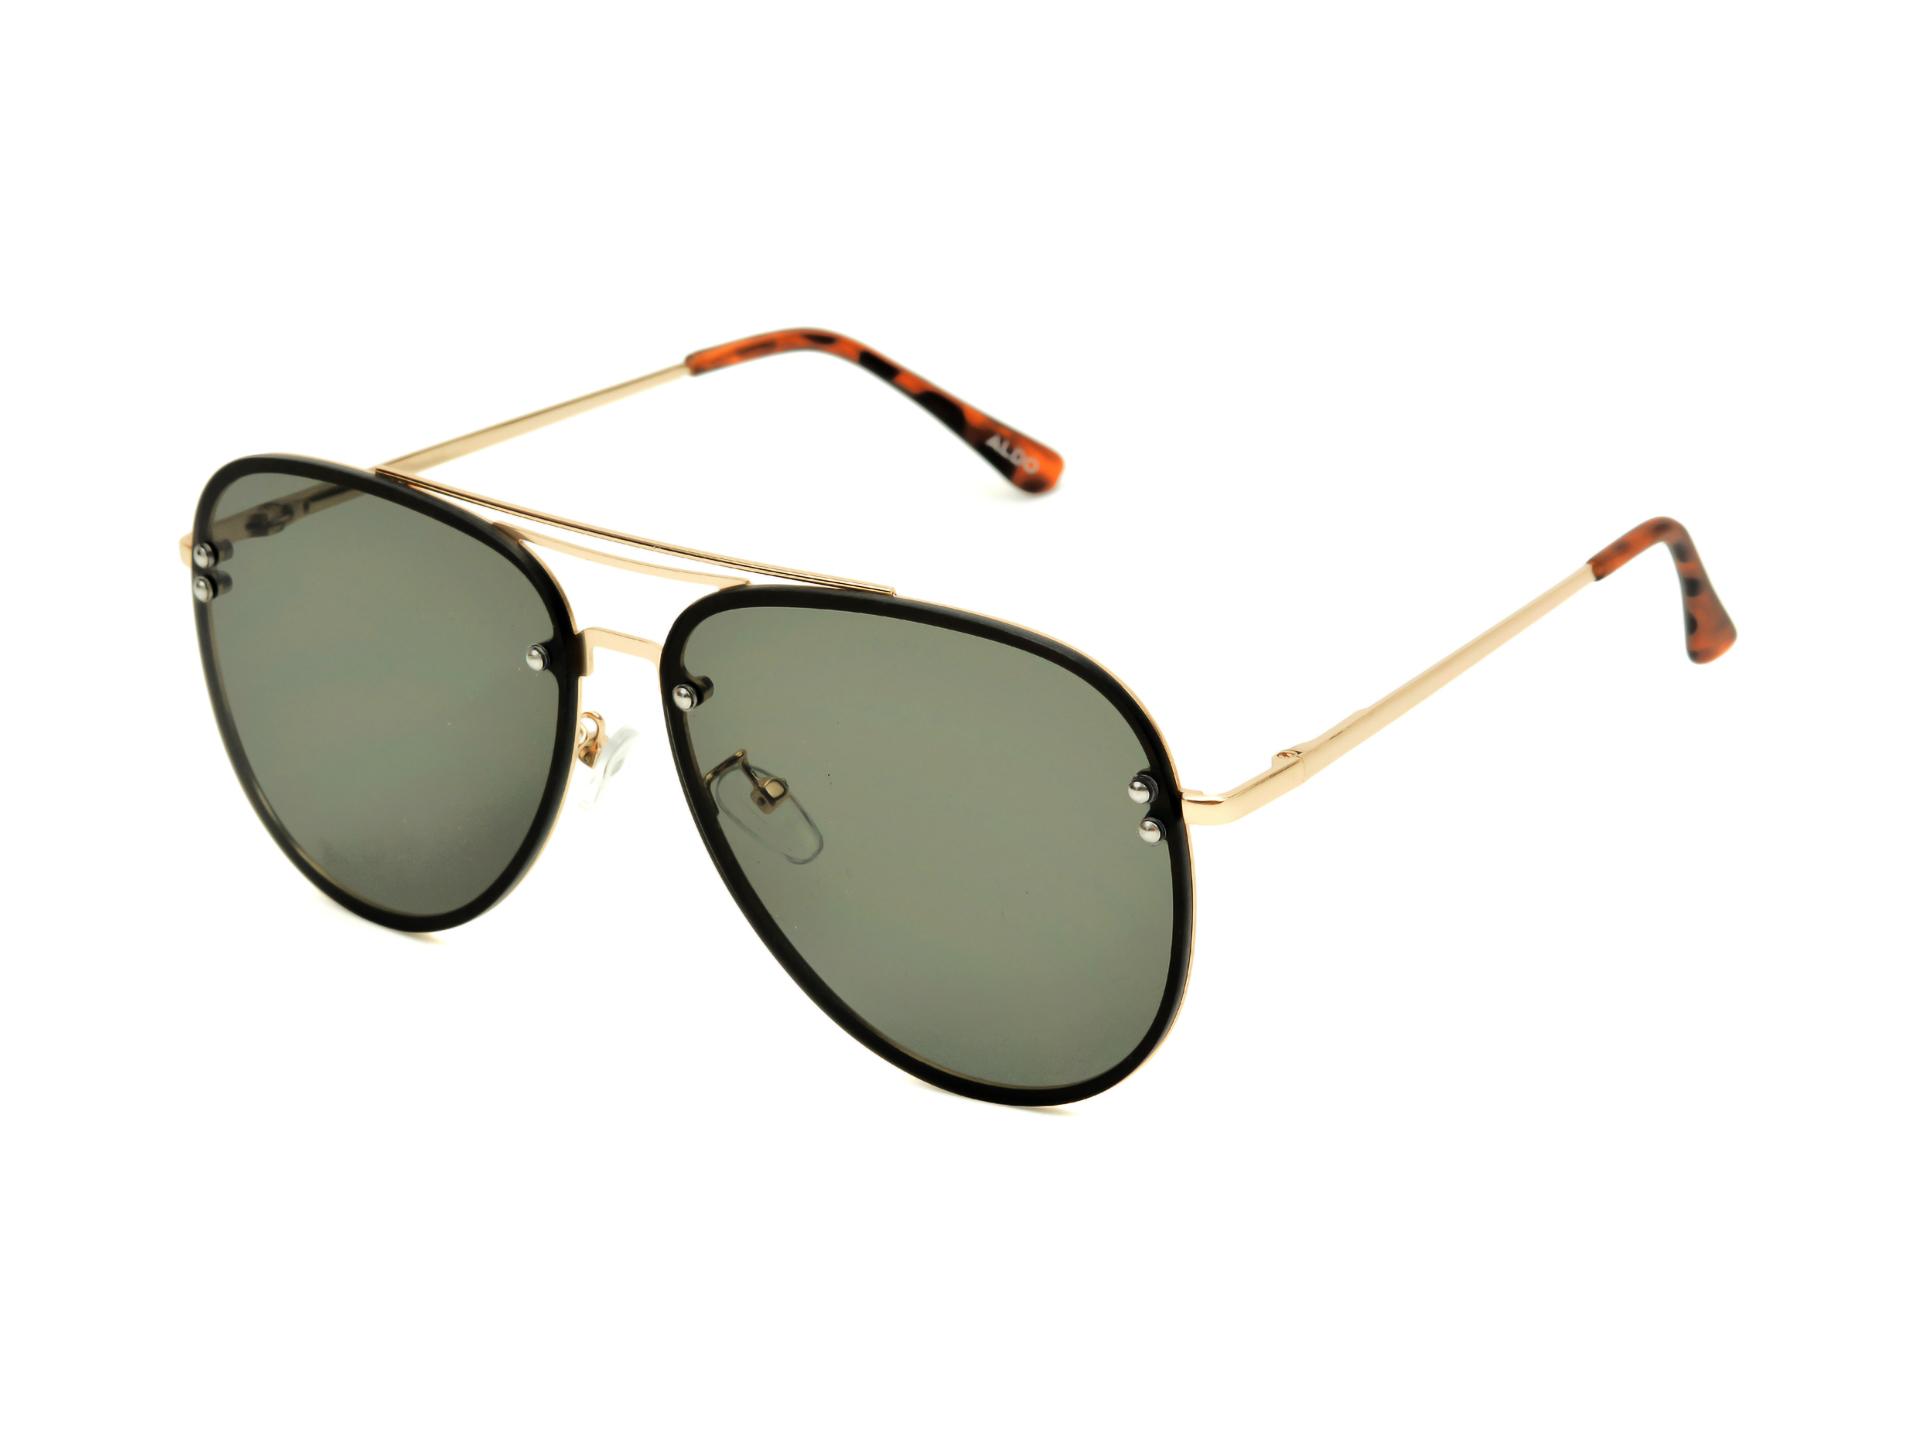 Ochelari de soare ALDO aurii, Horeven710, din PVC imagine